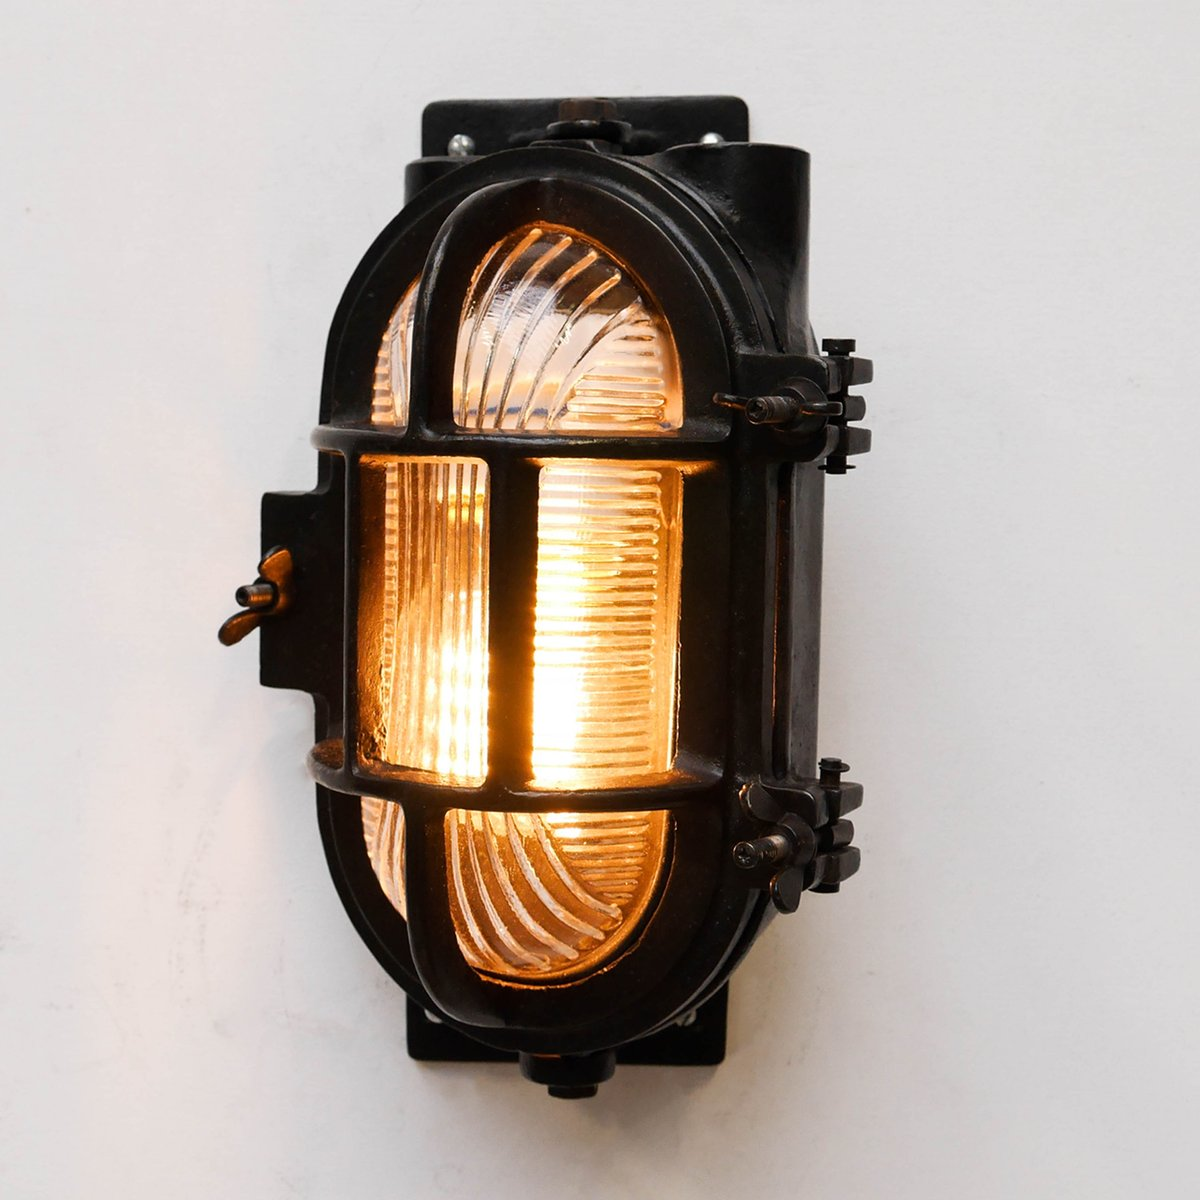 drehbare vintage wandlampe bei pamono kaufen. Black Bedroom Furniture Sets. Home Design Ideas